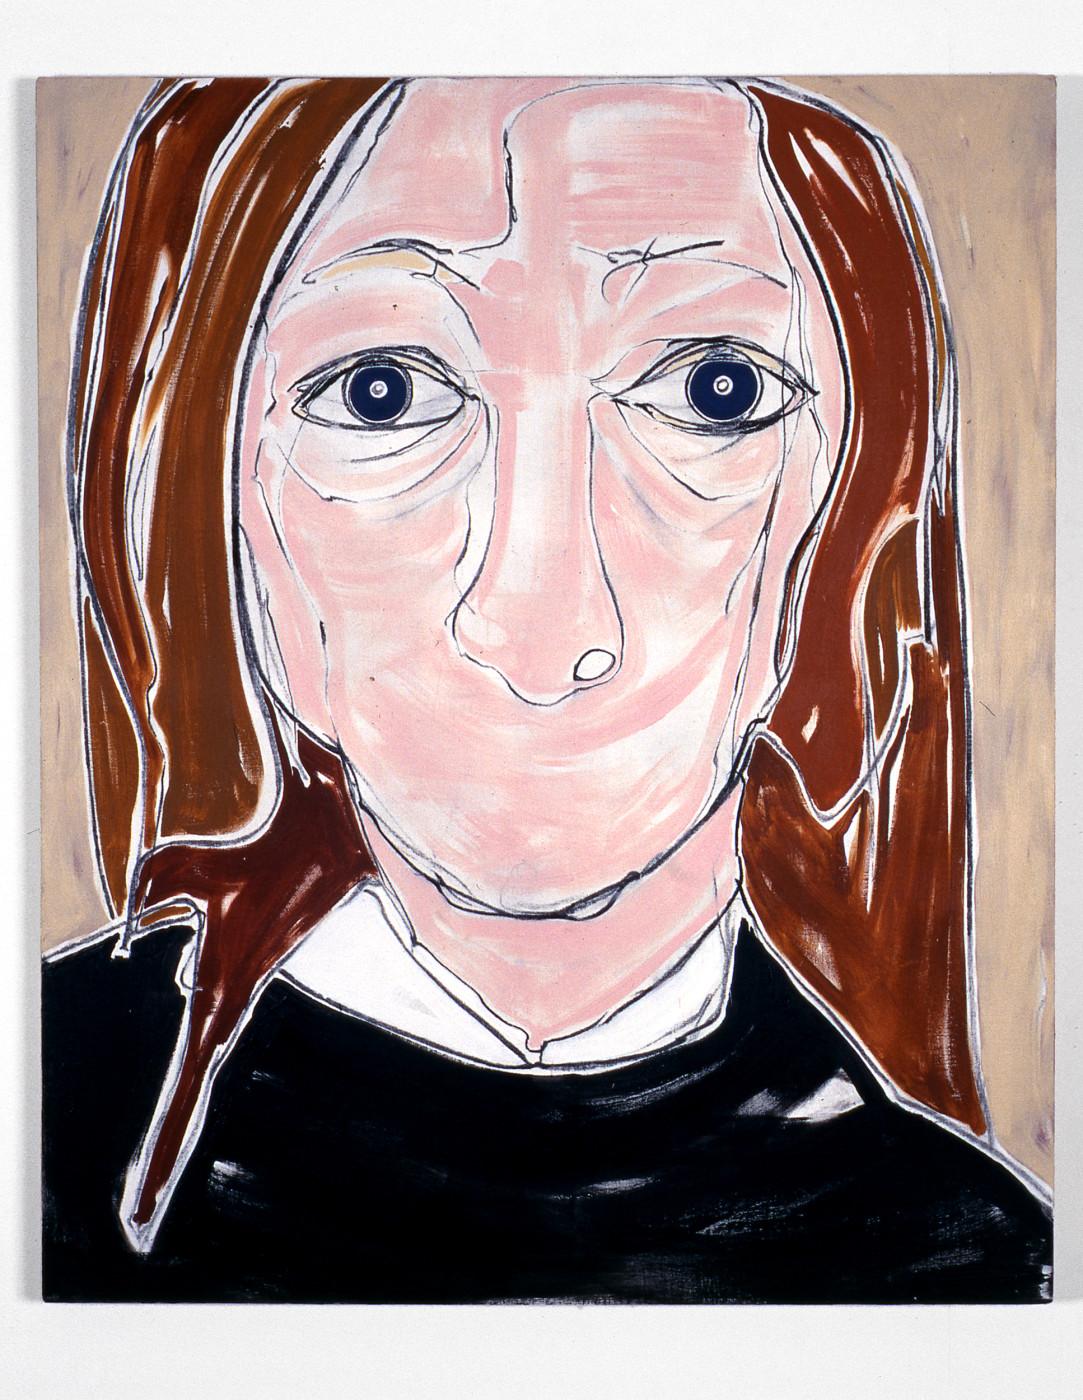 "<div class=""title""><em>Self Portrait, Head</em>, 2000</div><div class=""medium"">acrylic on canvas</div><div class=""dimensions"">142.24 x 167.64 cm<br />56 x 66 in.</div>"